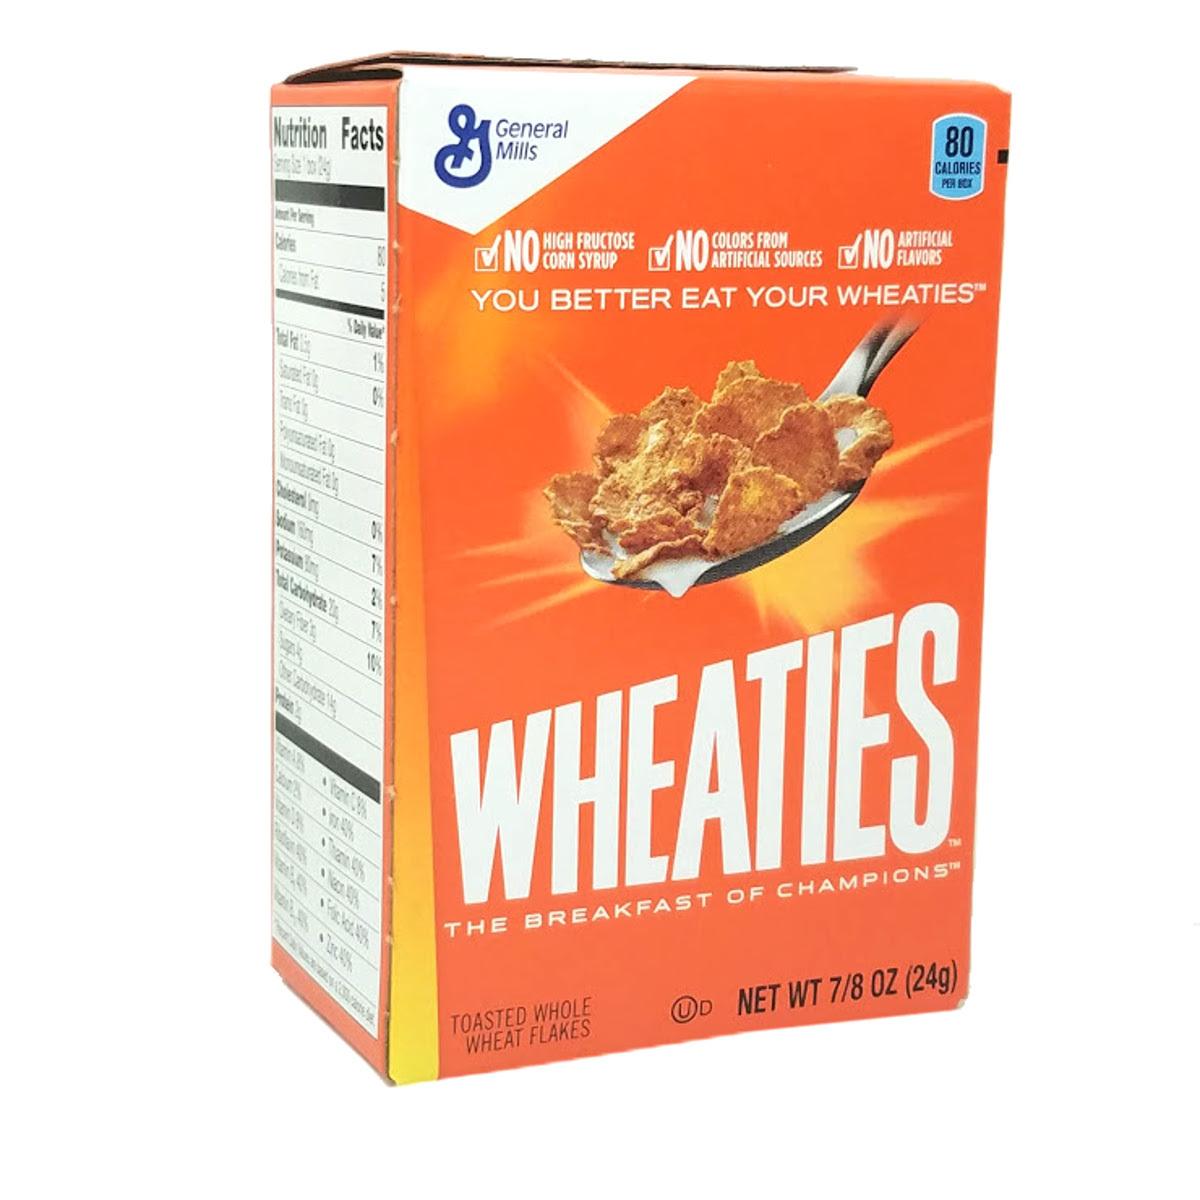 Wholesale General Mills Wheaties Cereal Box 7/8 Oz (SKU